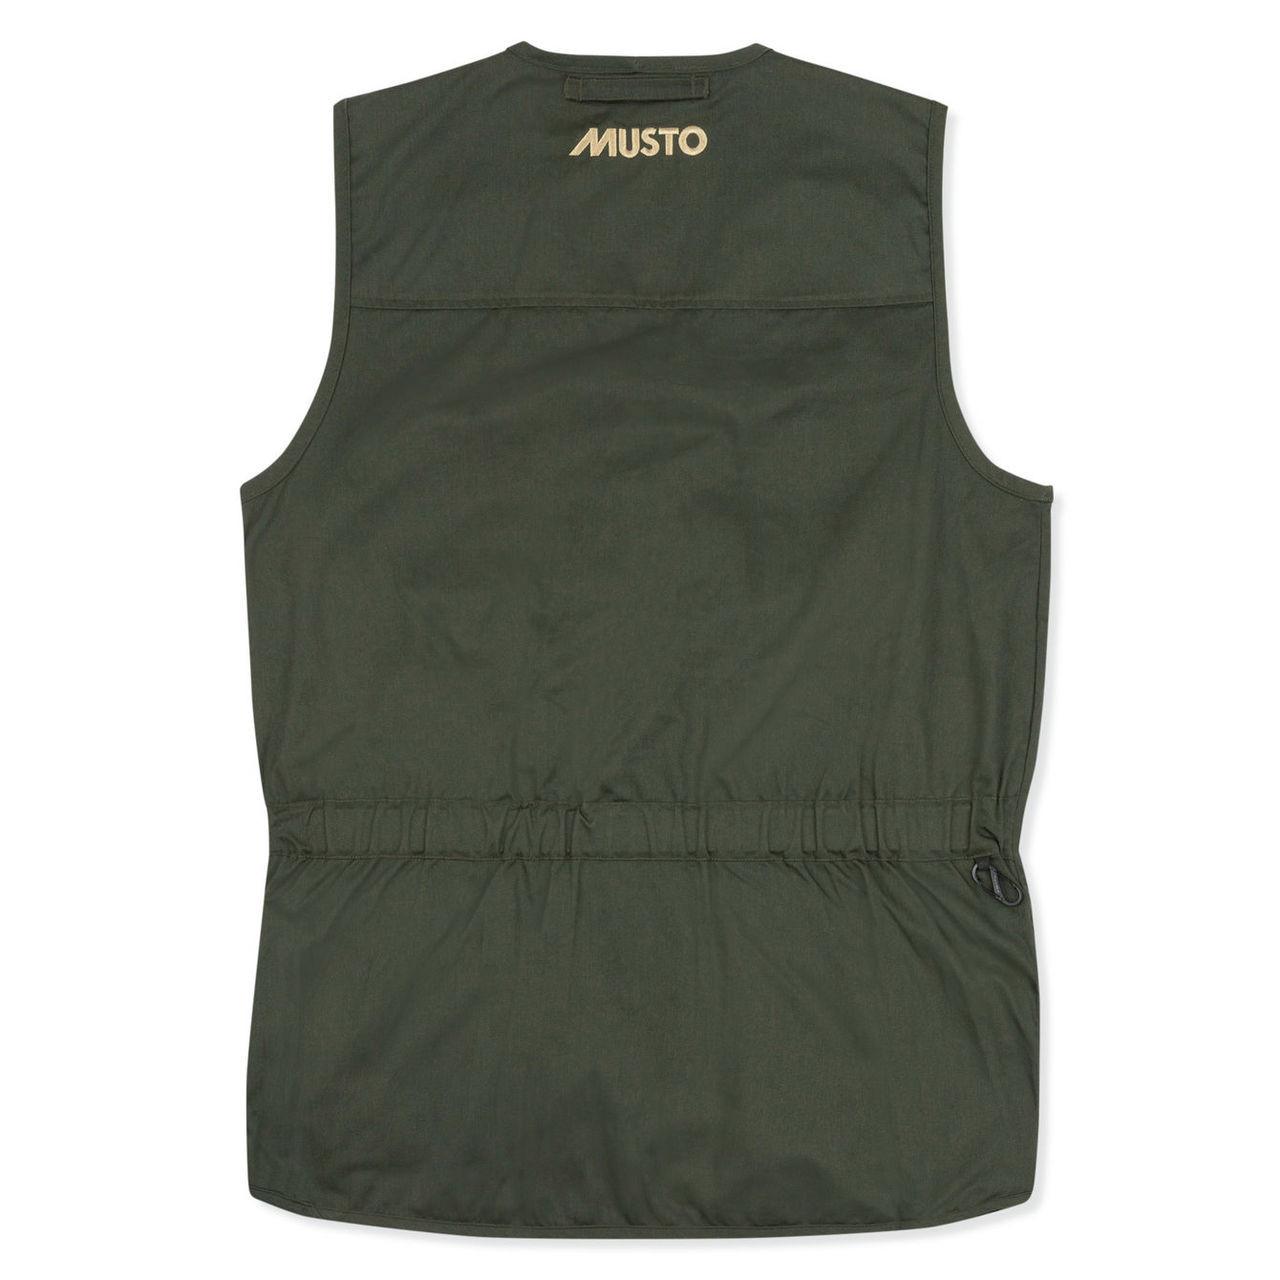 Musto Clay Shooting Vest